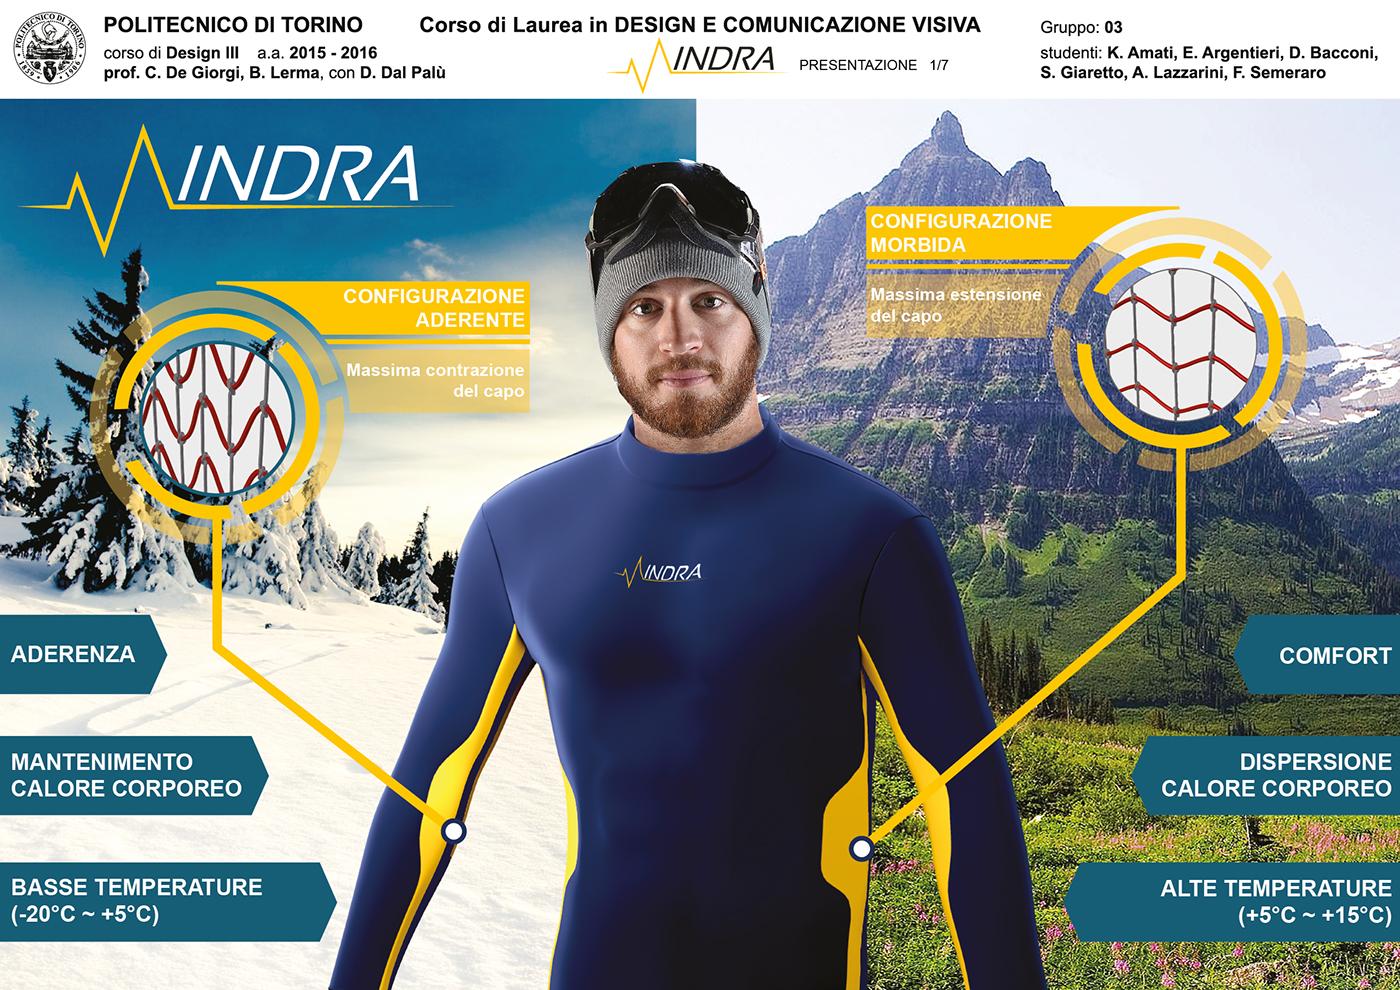 Indra smart materials extreme adventures 2016 on behance for Semeraro arredamenti torino